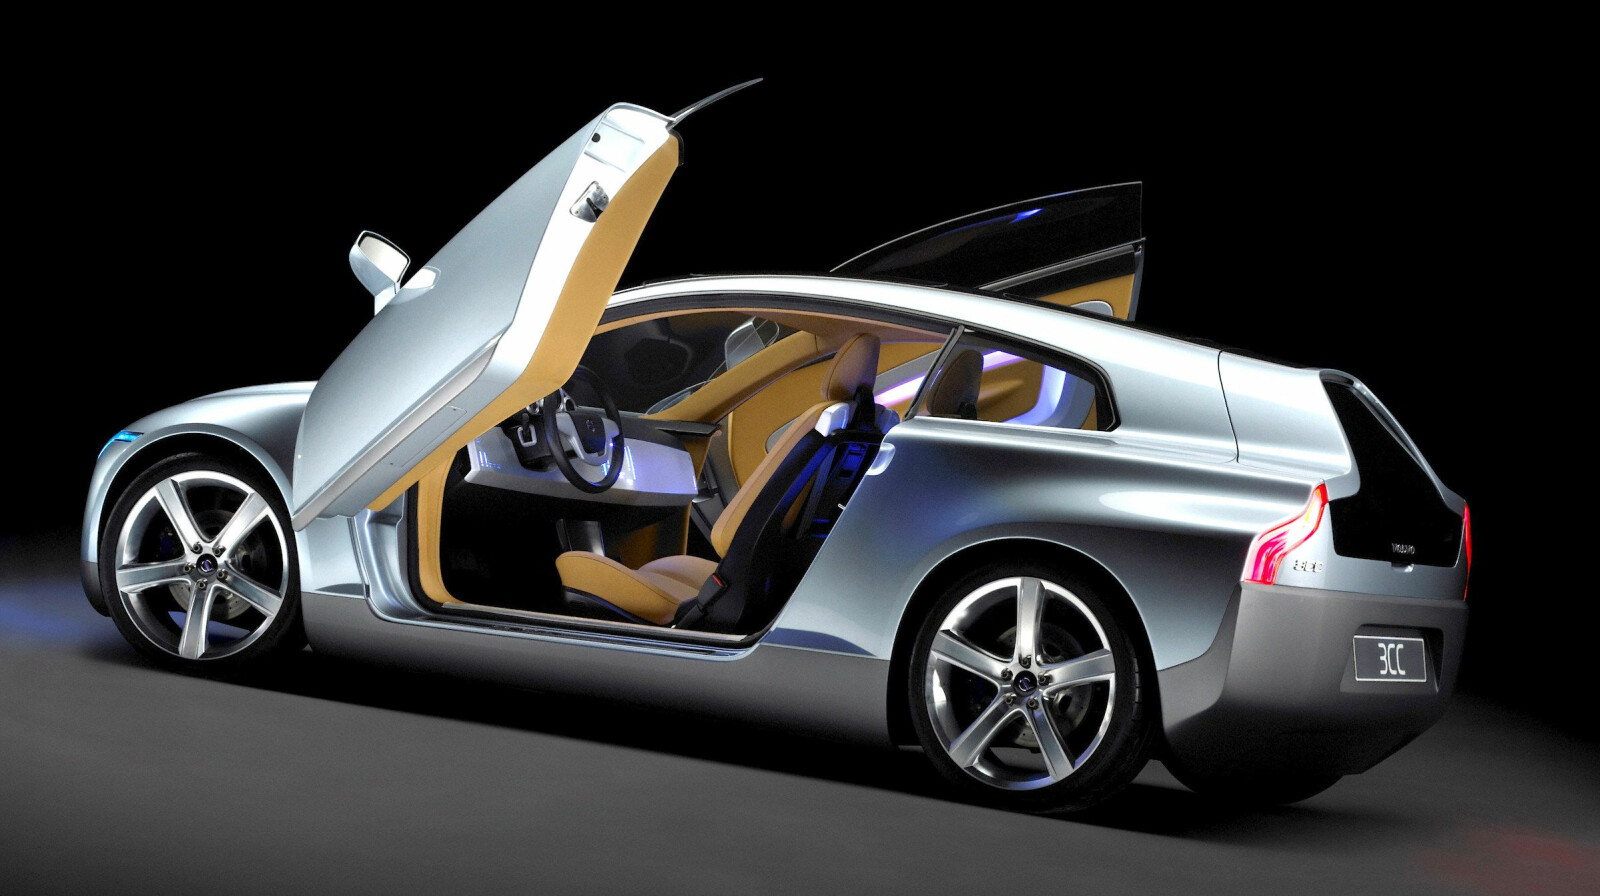 <b><SPAN CLASS=BOLD><STRONG>ELBIL:</b></strong> </span>Volvo 3CC var langt forut sin tid. En helelektrisk Volvo laget i høyfast stål og karbon.